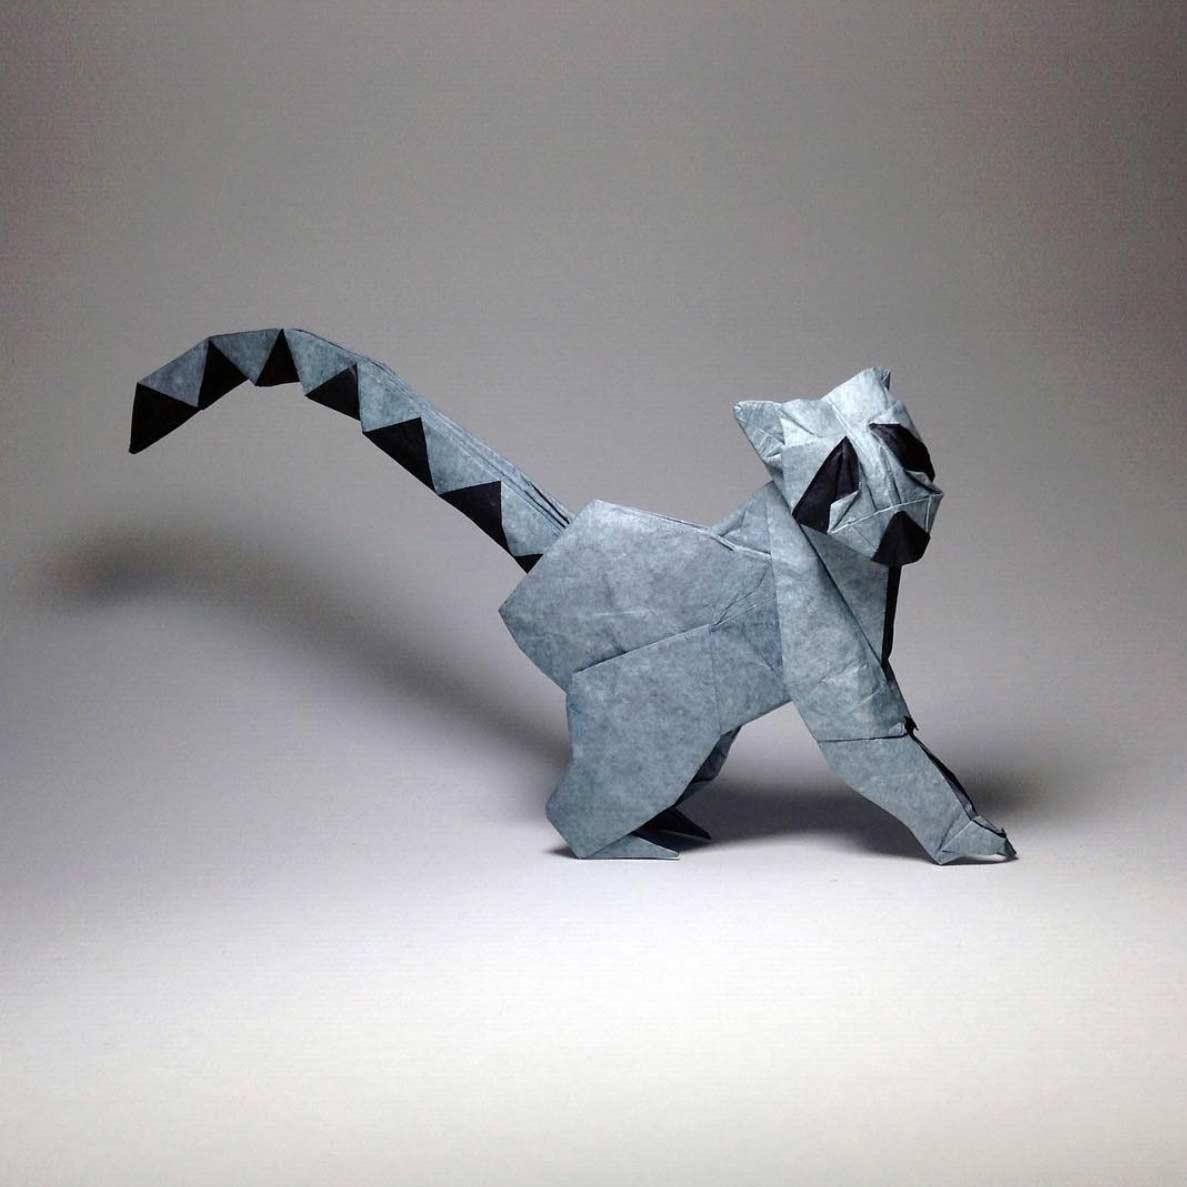 Geniale Origami-Kunstwerke von Robby Kraft Robby-Kraft-Origami_04